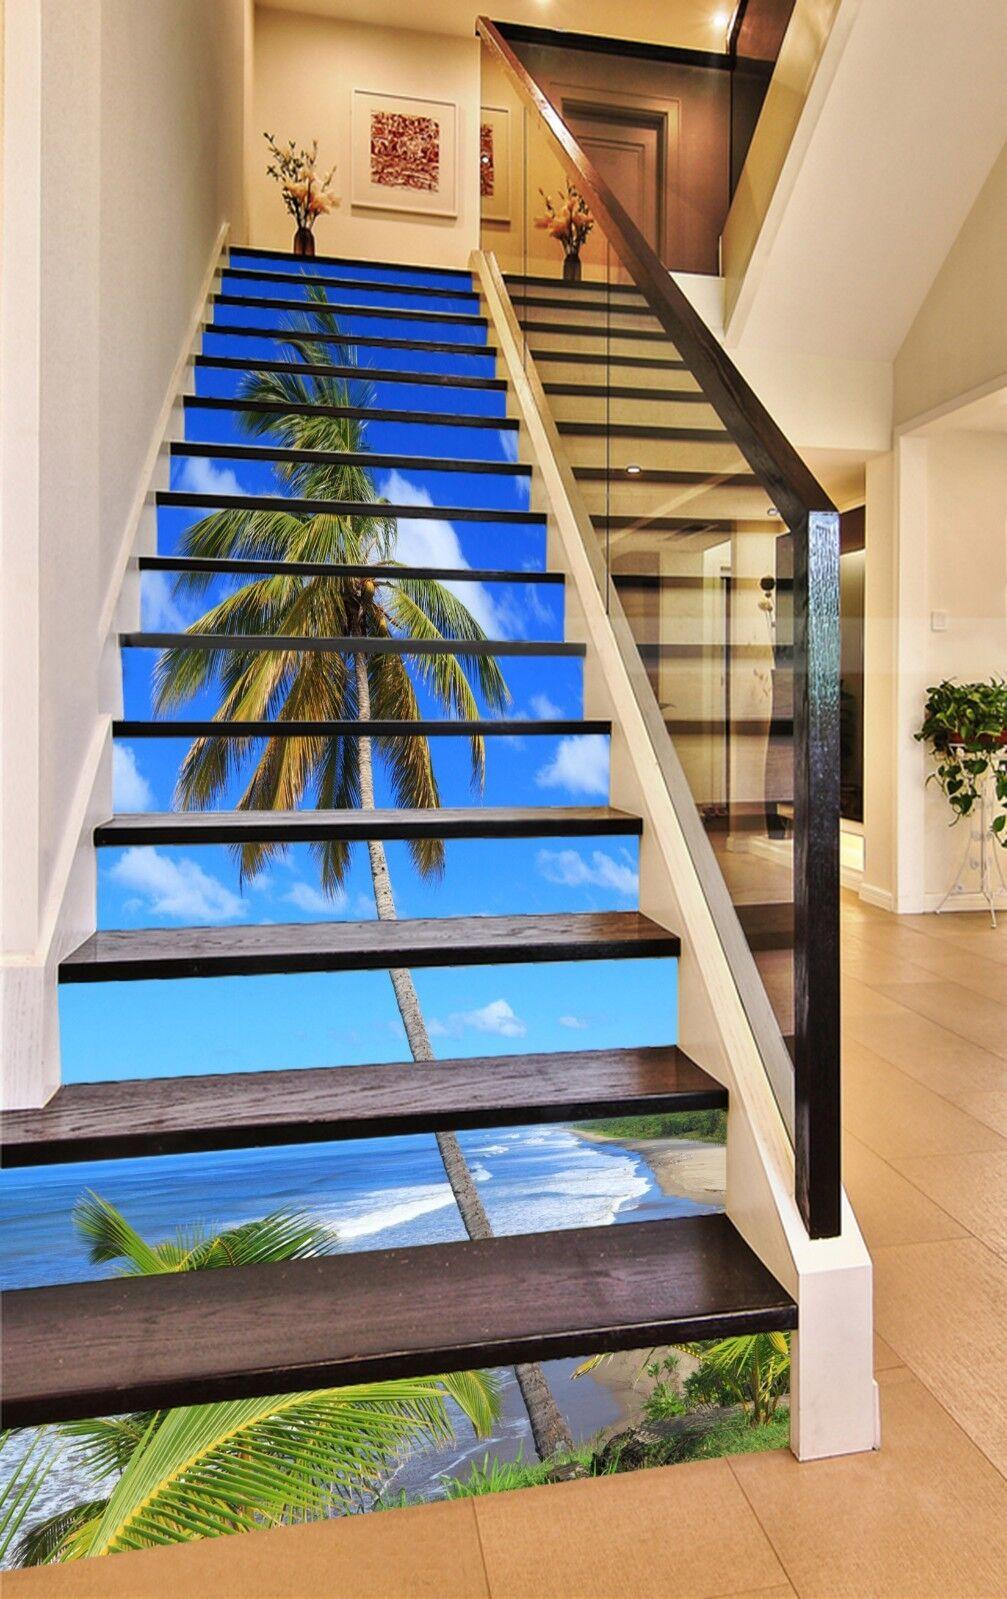 3D Skt Tree 23 Stair Risers Decoration Photo Mural Vinyl Decal Wallpaper CA